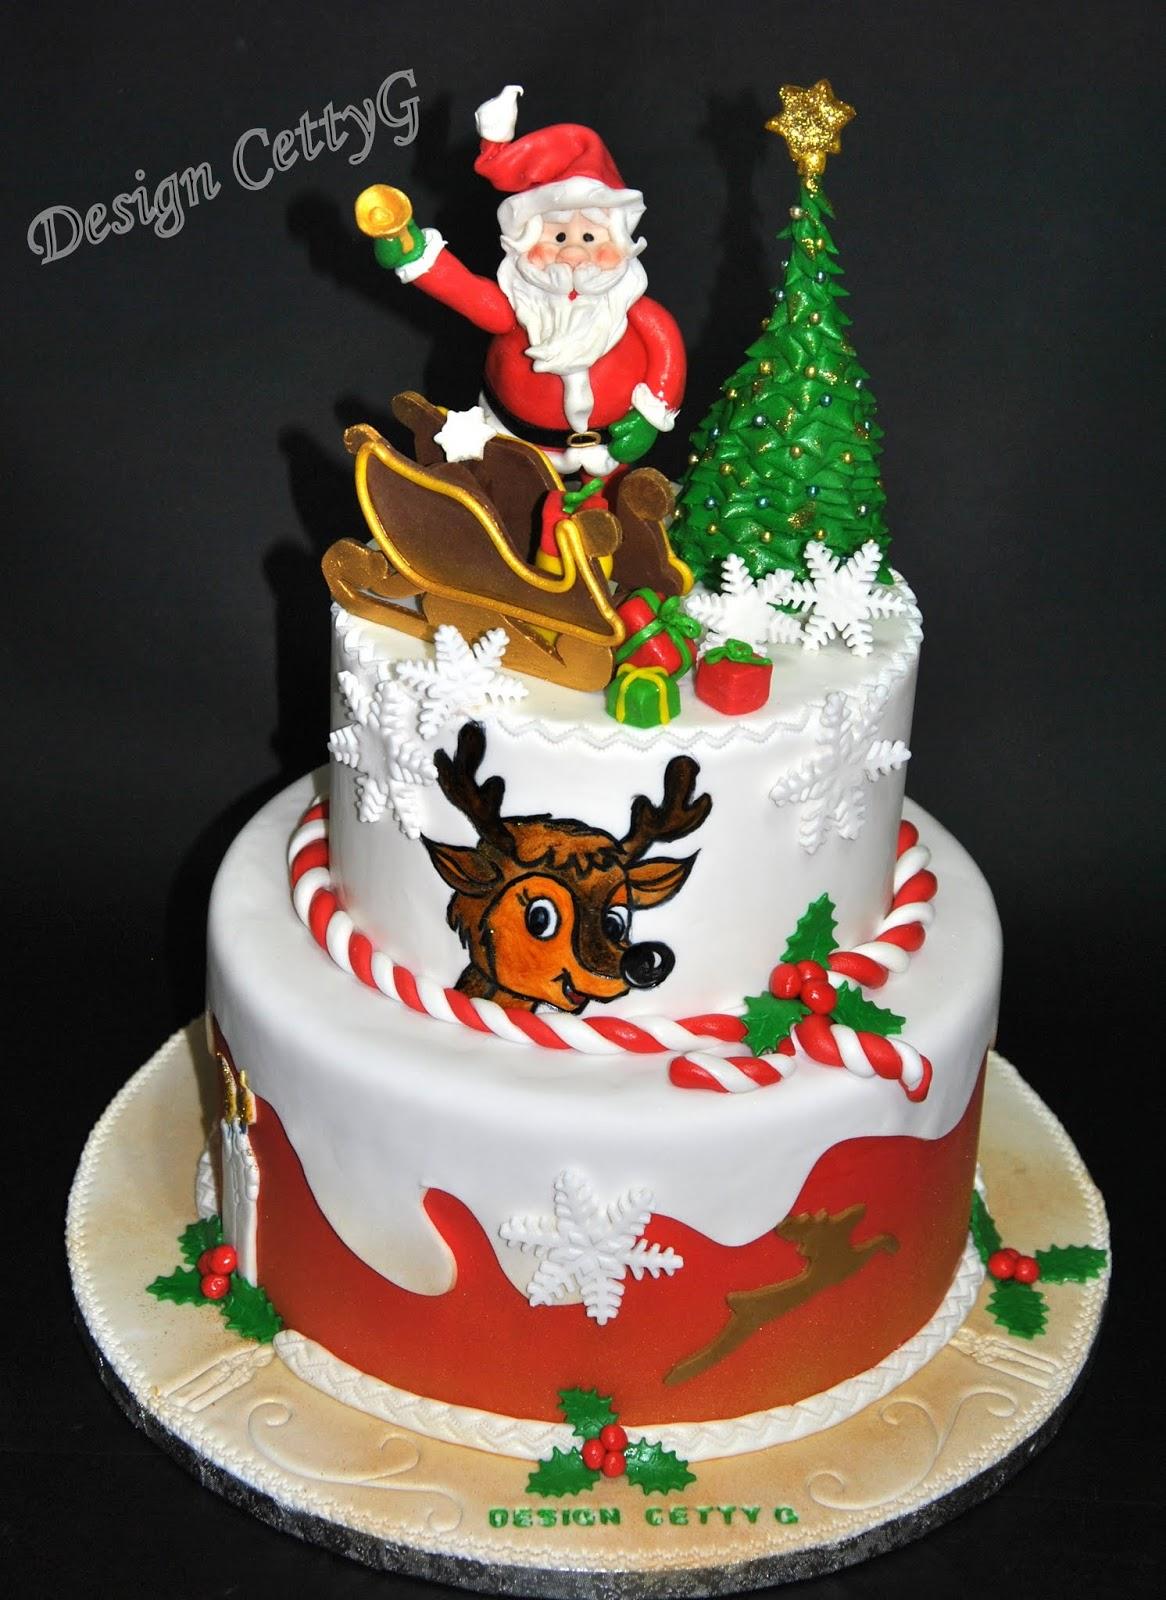 Le torte decorate di cettyg cake natale 2014 - Torte natalizie decorate ...